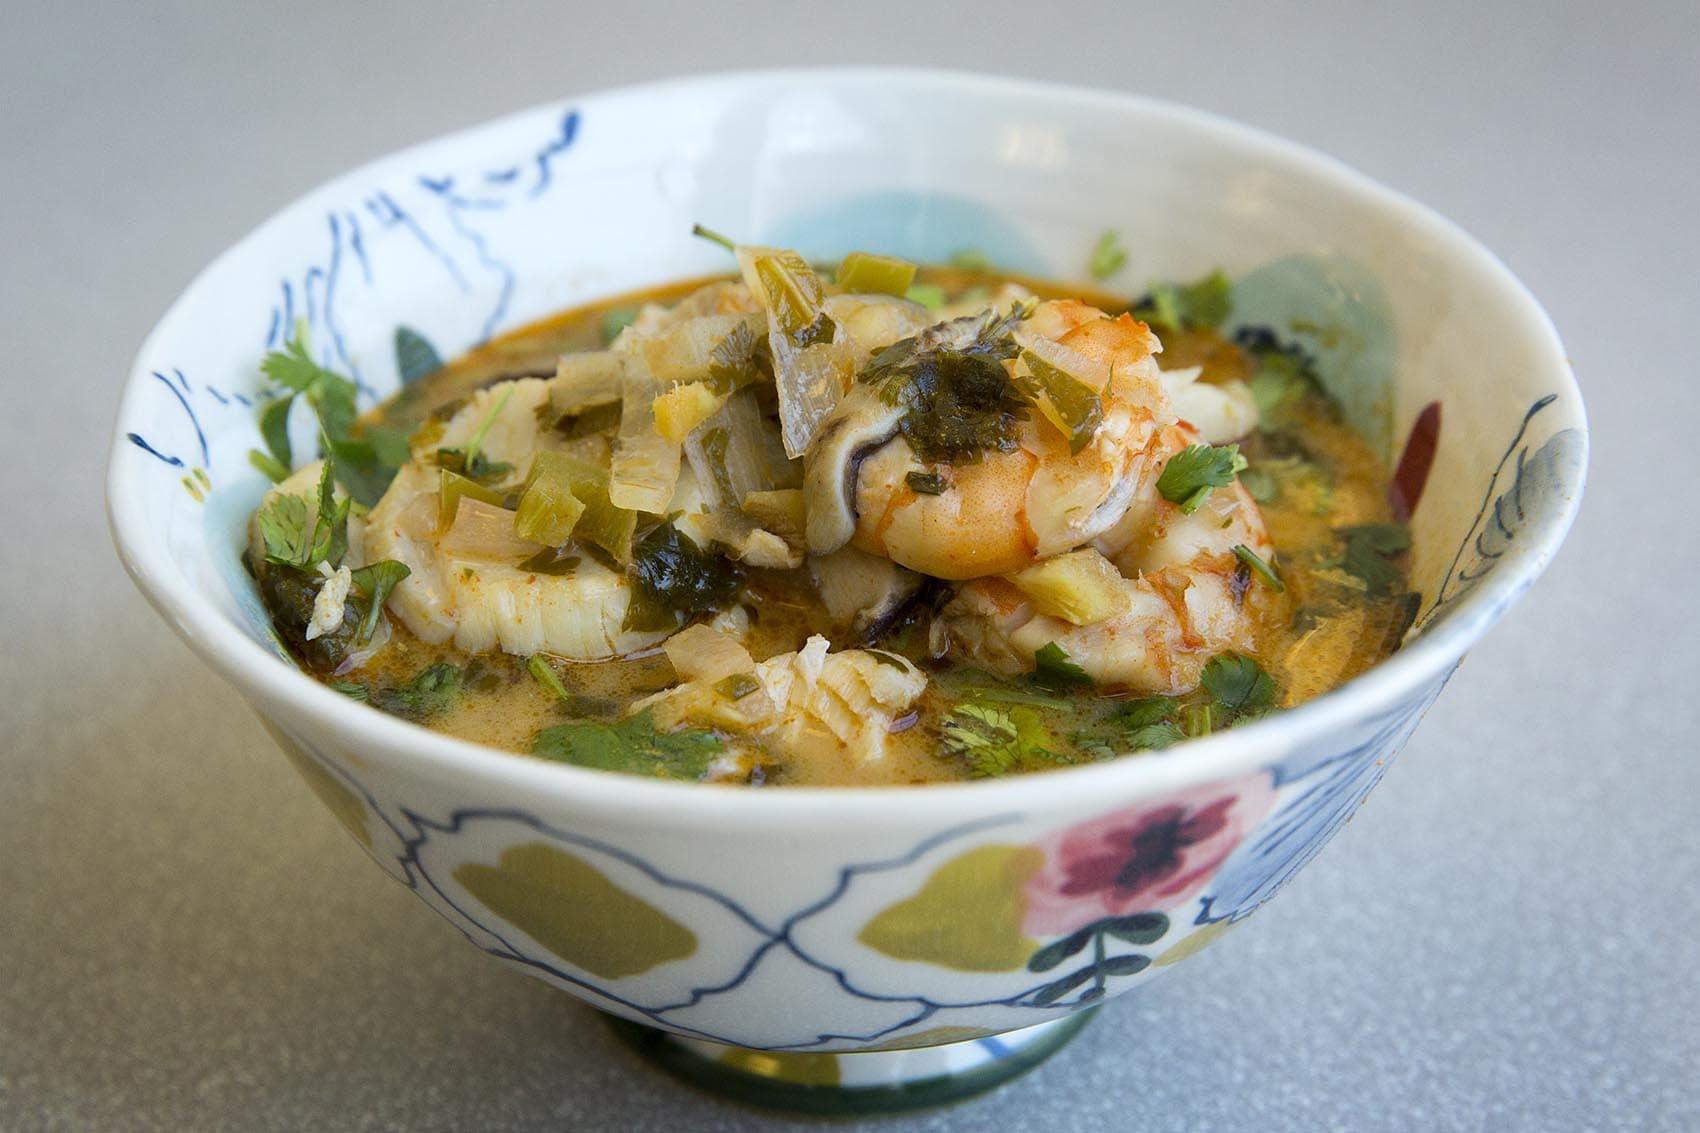 Kathy's Southeast Asian-style fish soup. (Robin Lubbock/WBUR)